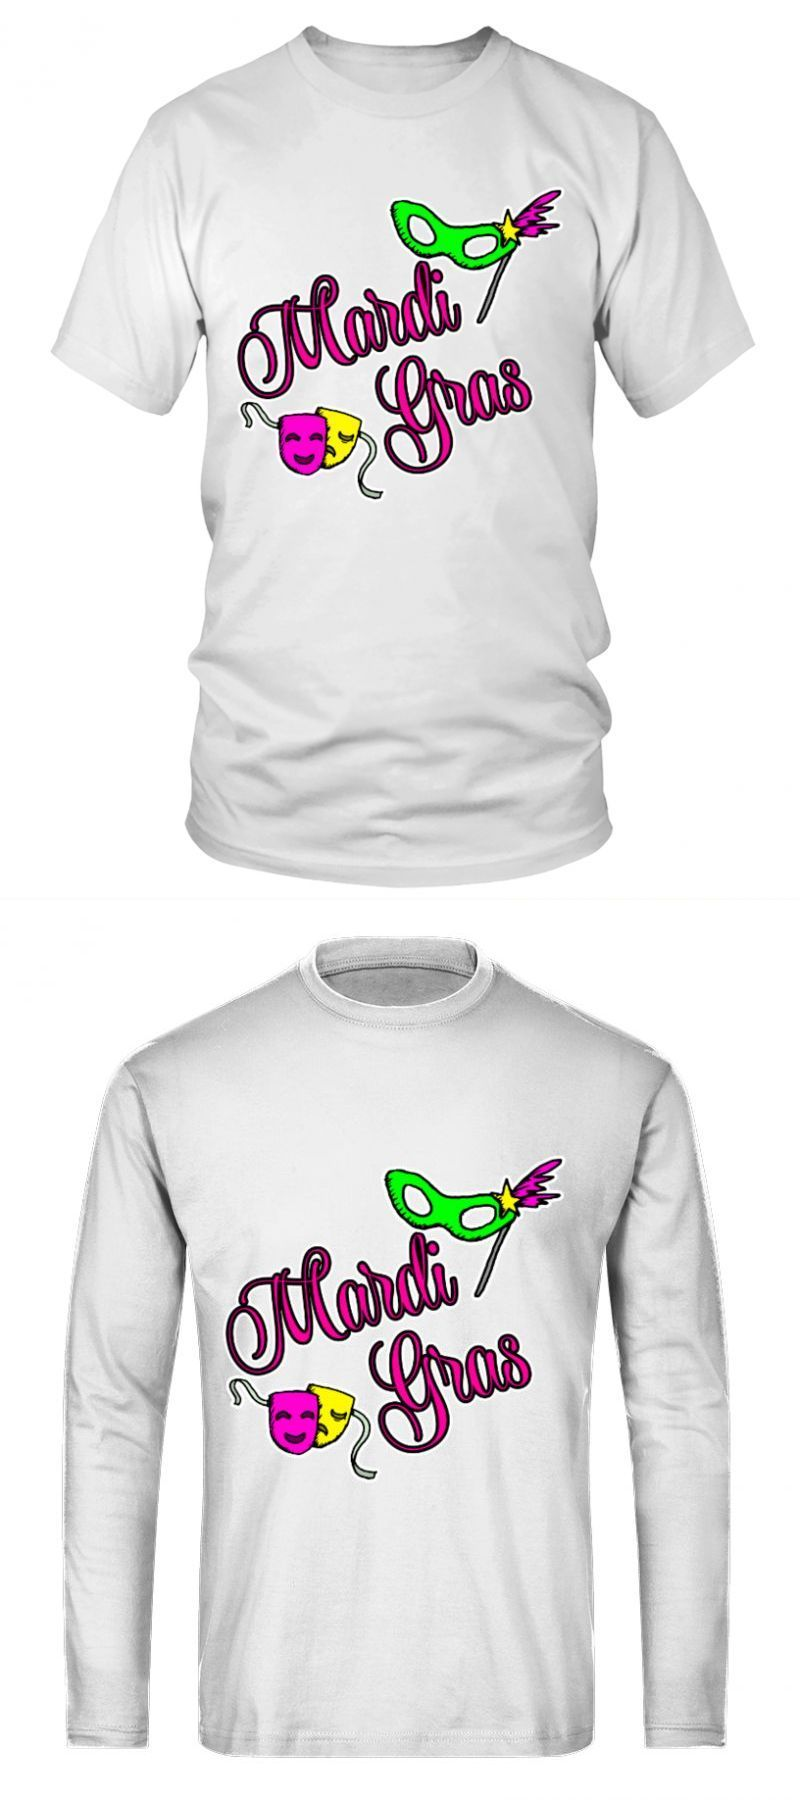 bda13322 Mardi gras t shirt designs mardi gras day mardi gras t shirt ideas #mardi # gras #shirt #designs #day #ideas #round #neck #t-shirt #unisex #long  #sleeved